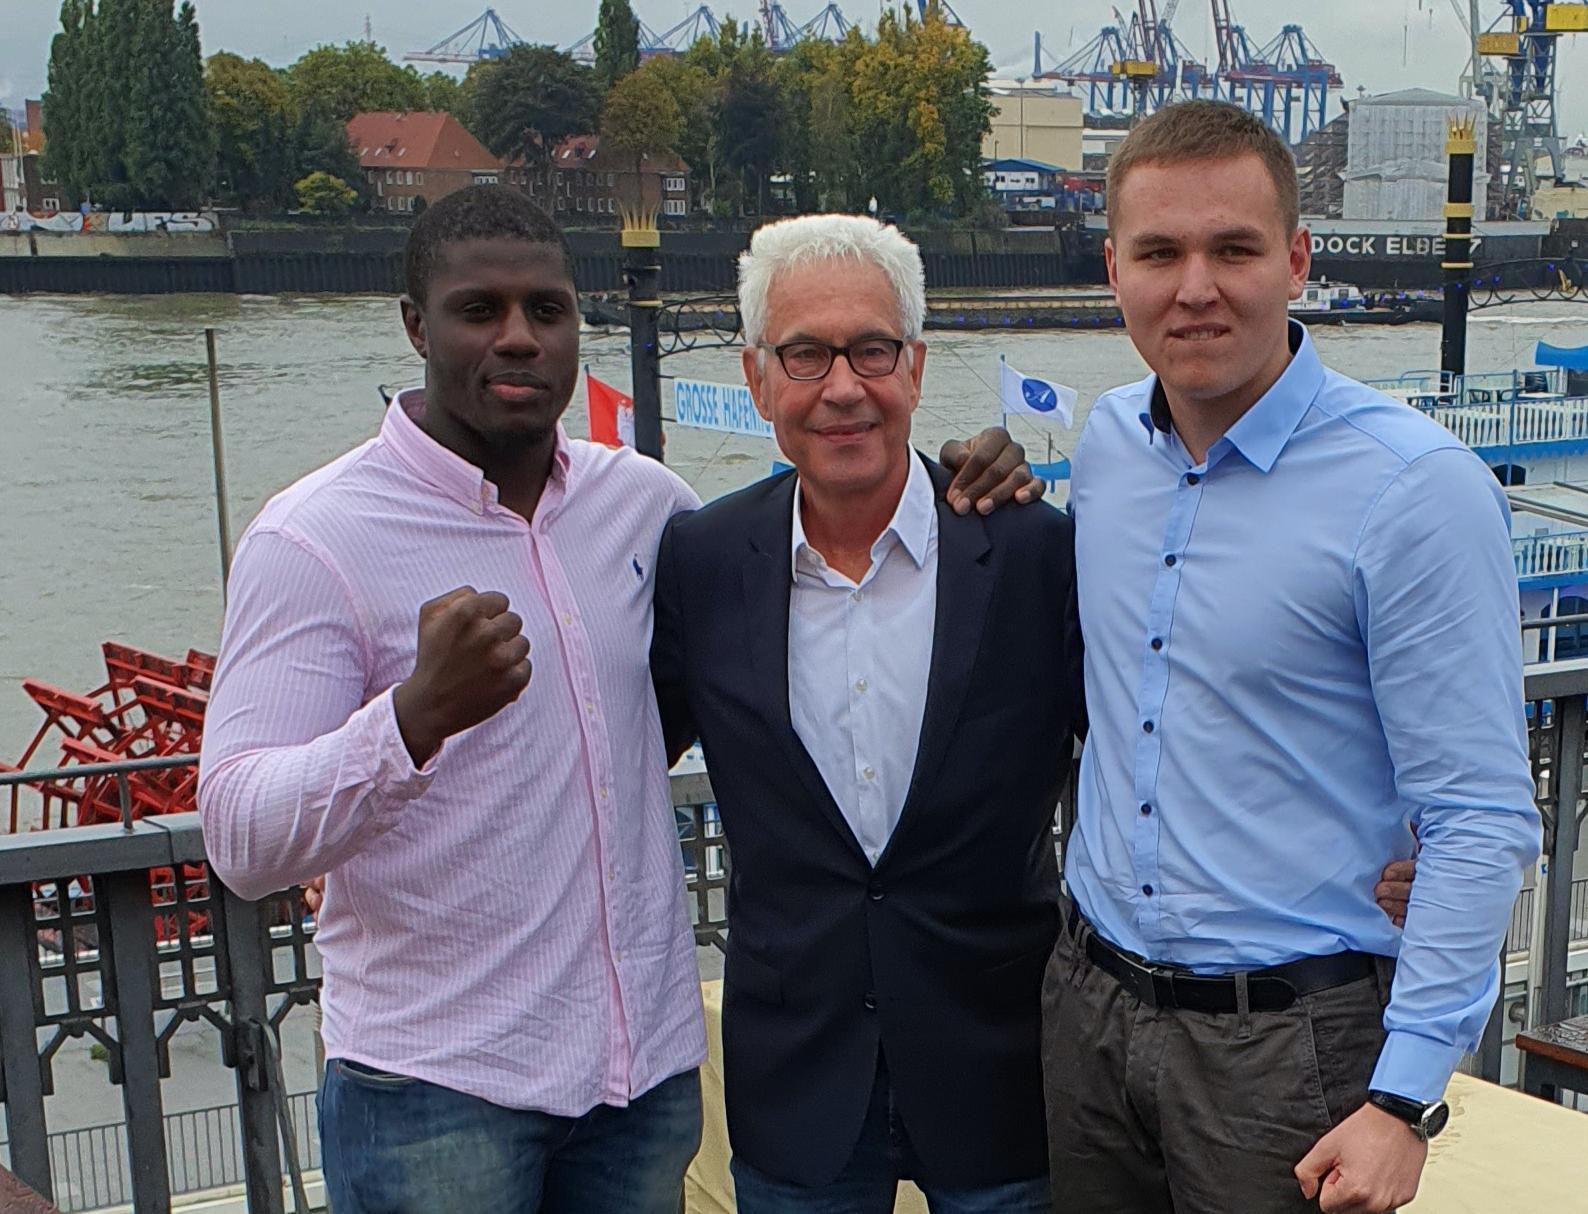 Peter Kadiru, Bernd Bönte und Victor Jurk